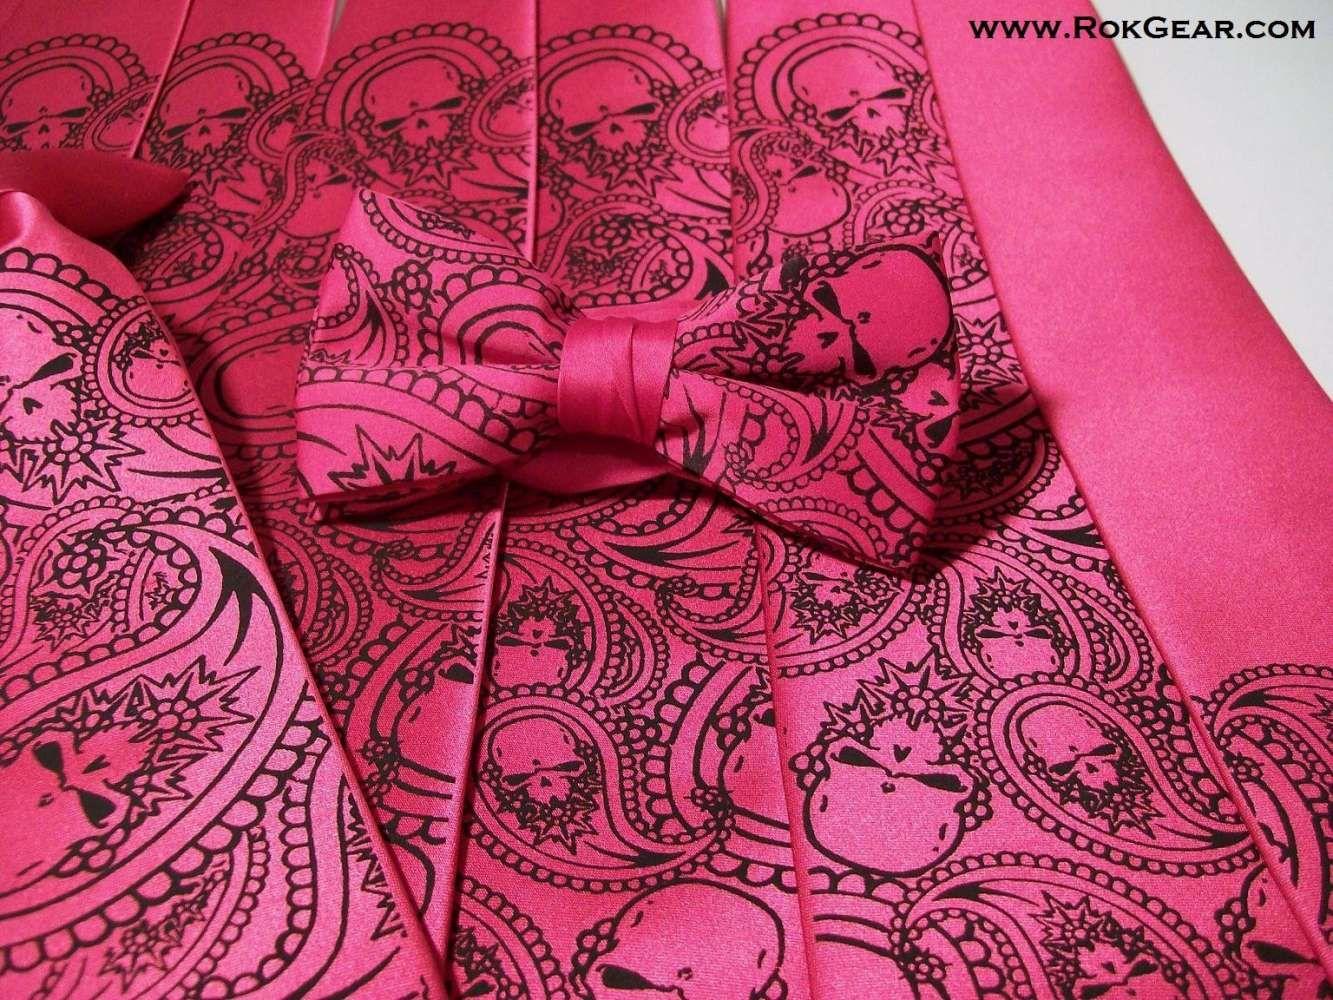 Paisley Skullz Design Printed In Black Ink On Fuchsia Ties Boy S Bow Tie Www